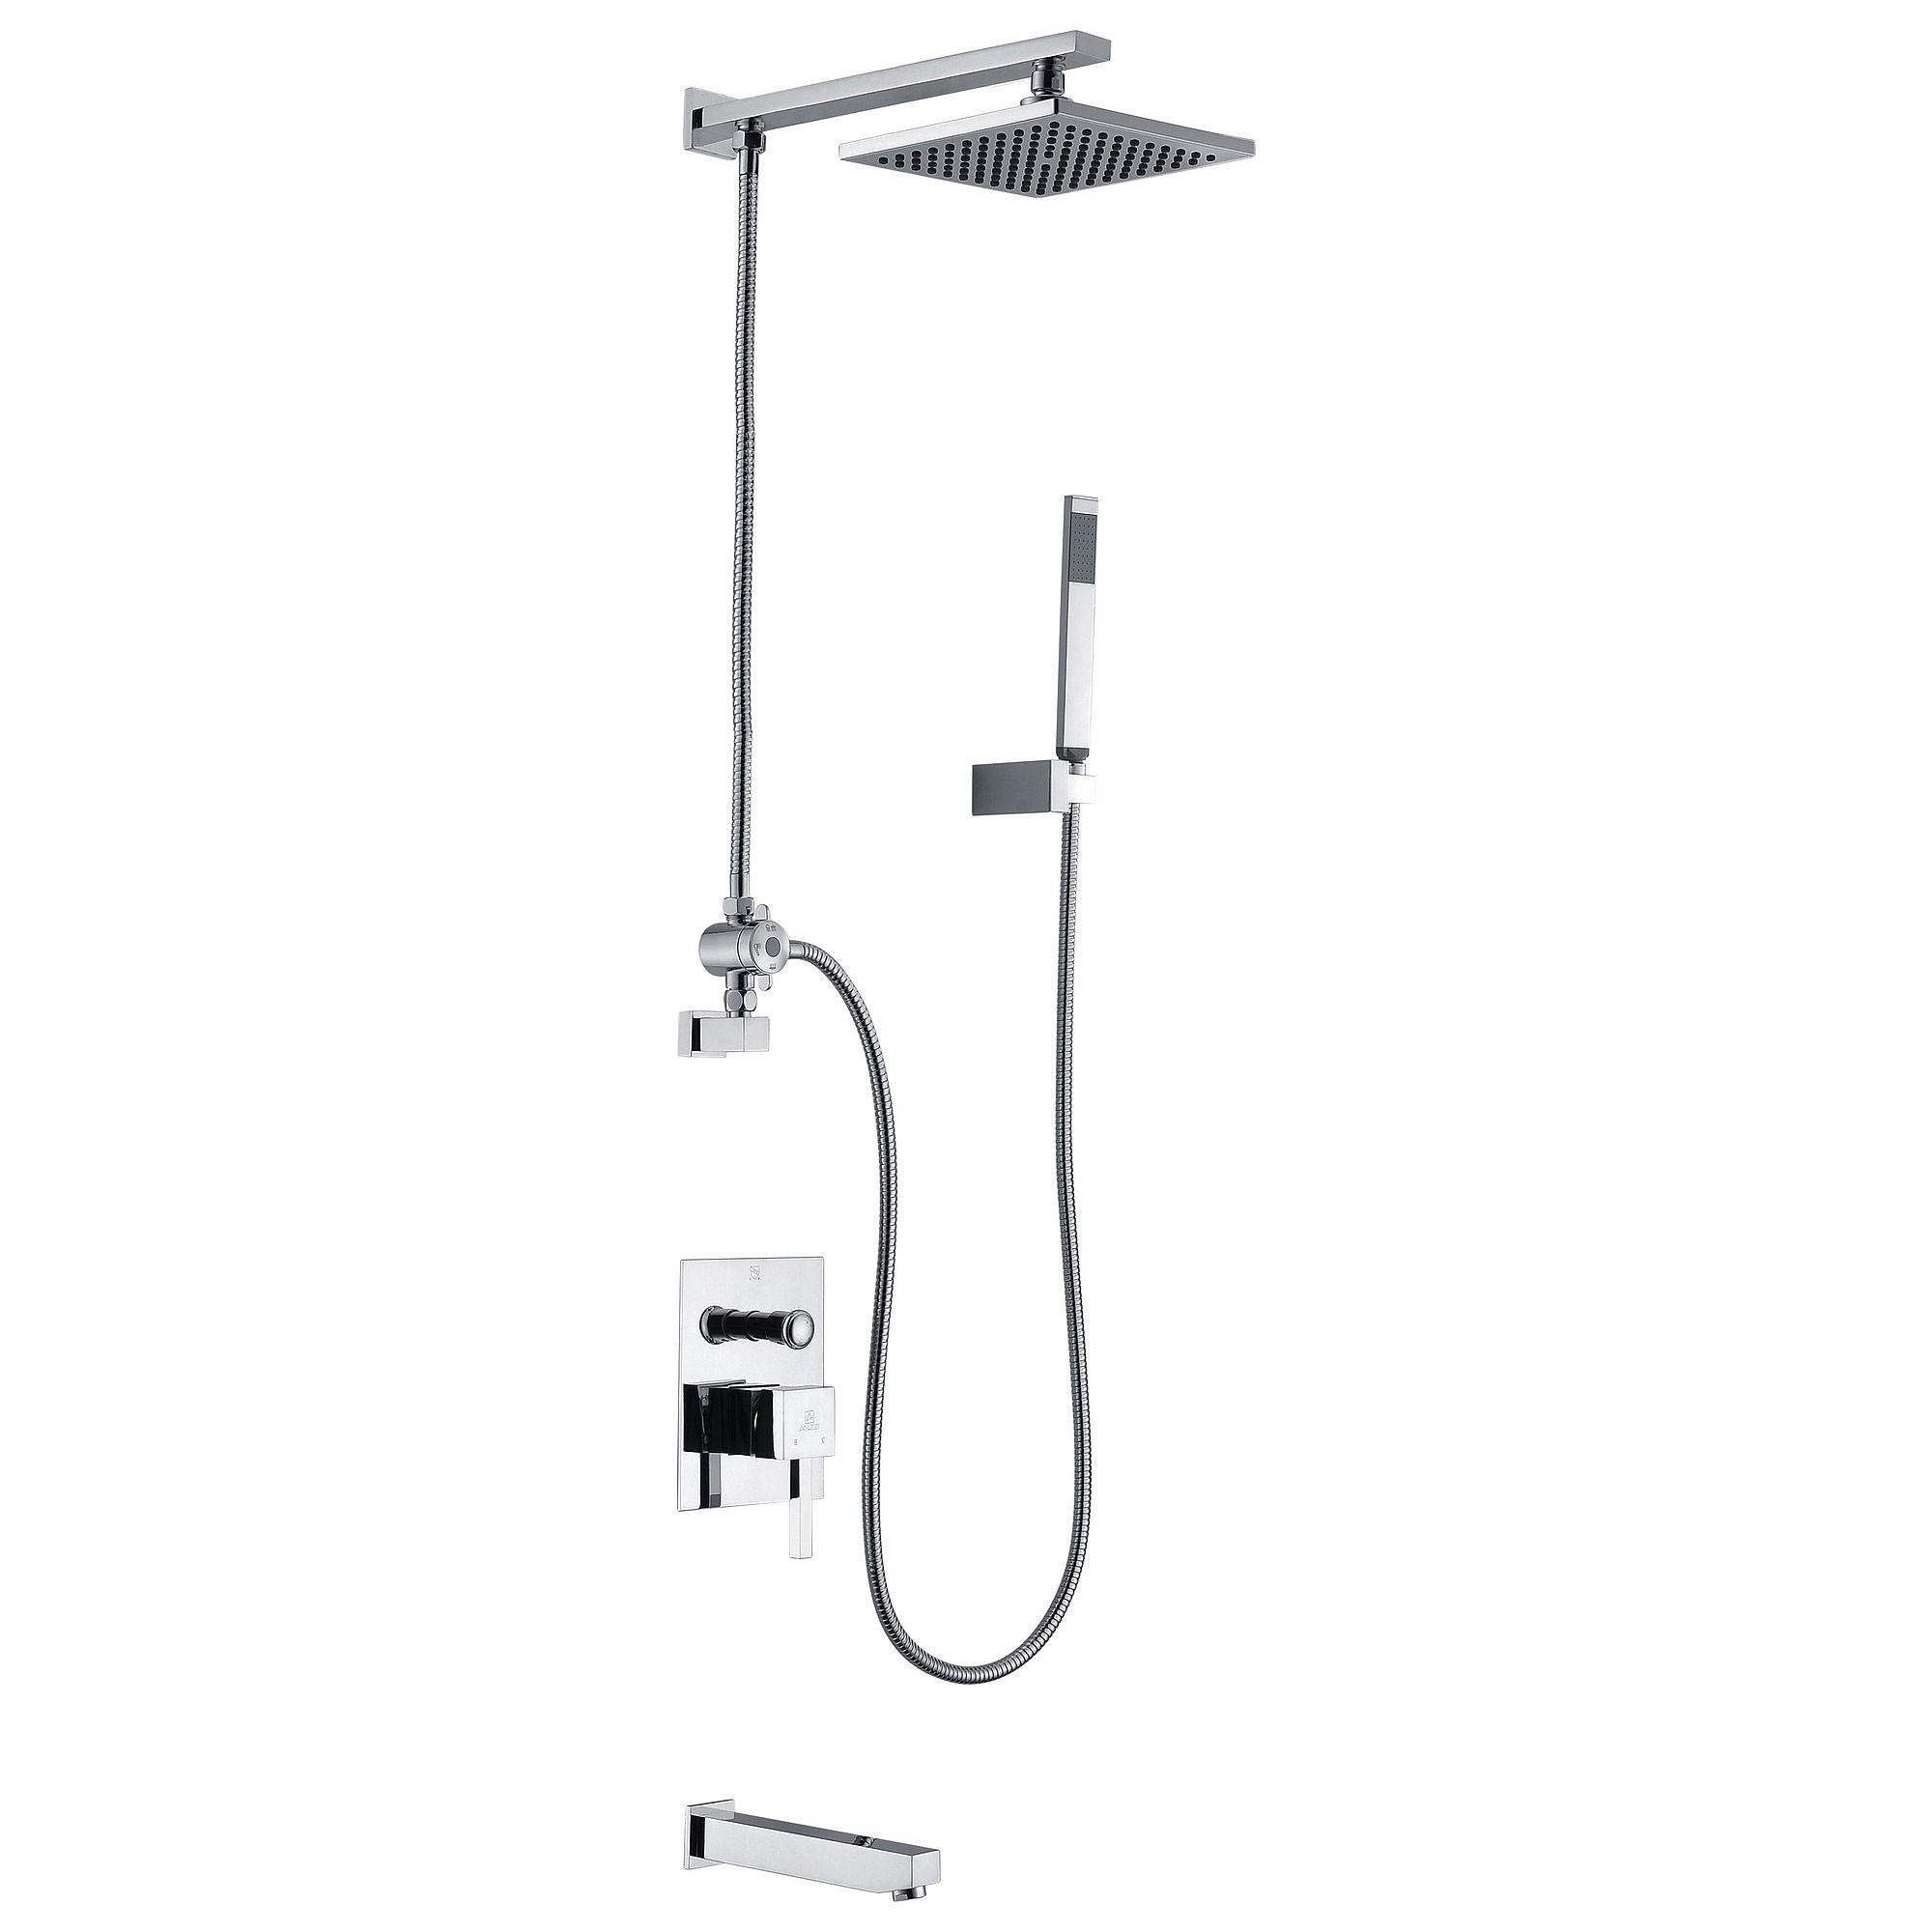 ANZZI SH-AZ013 Polished Chrome Byne Tub & Shower Faucet With Sprayer Wand